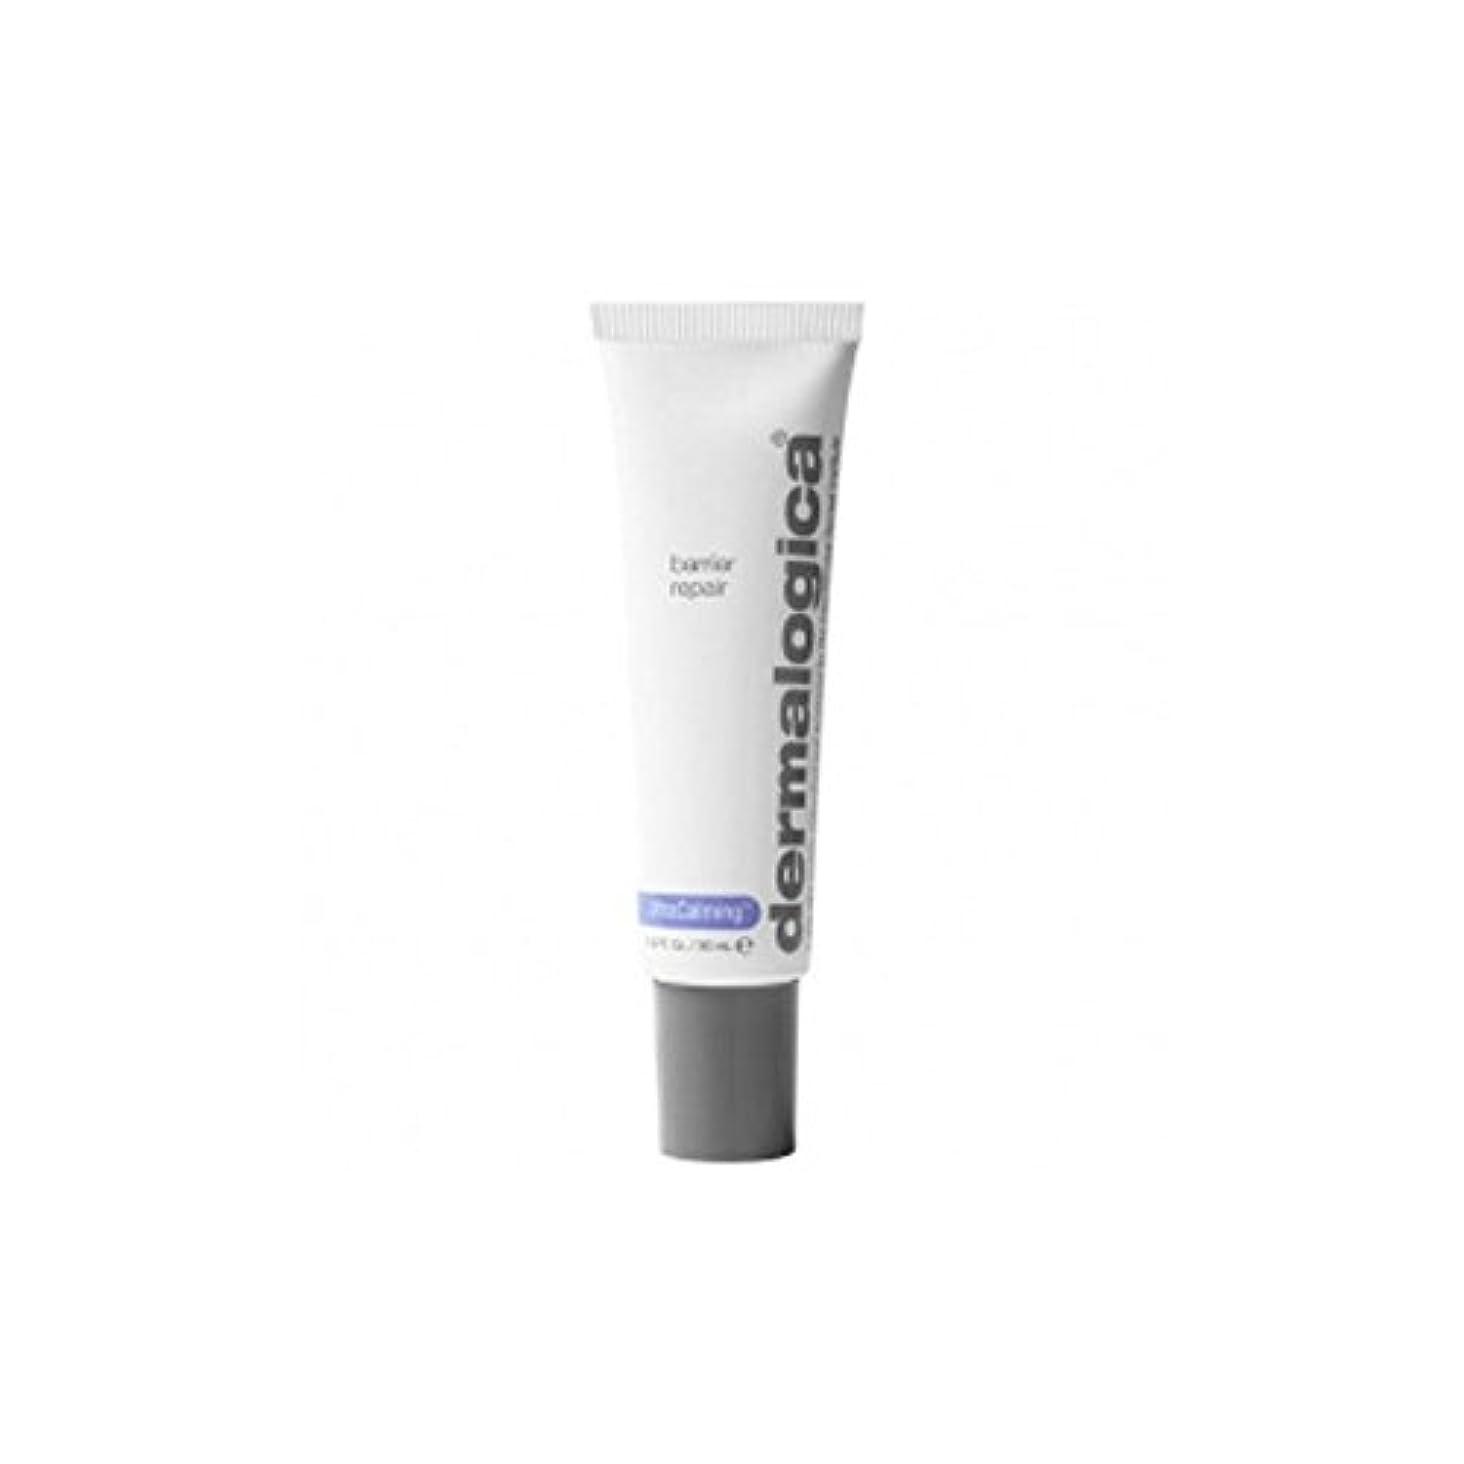 Dermalogica Ultracalming Barrier Repair (30ml) (Pack of 6) - ダーマロジカバリアリペア(30ミリリットル) x6 [並行輸入品]